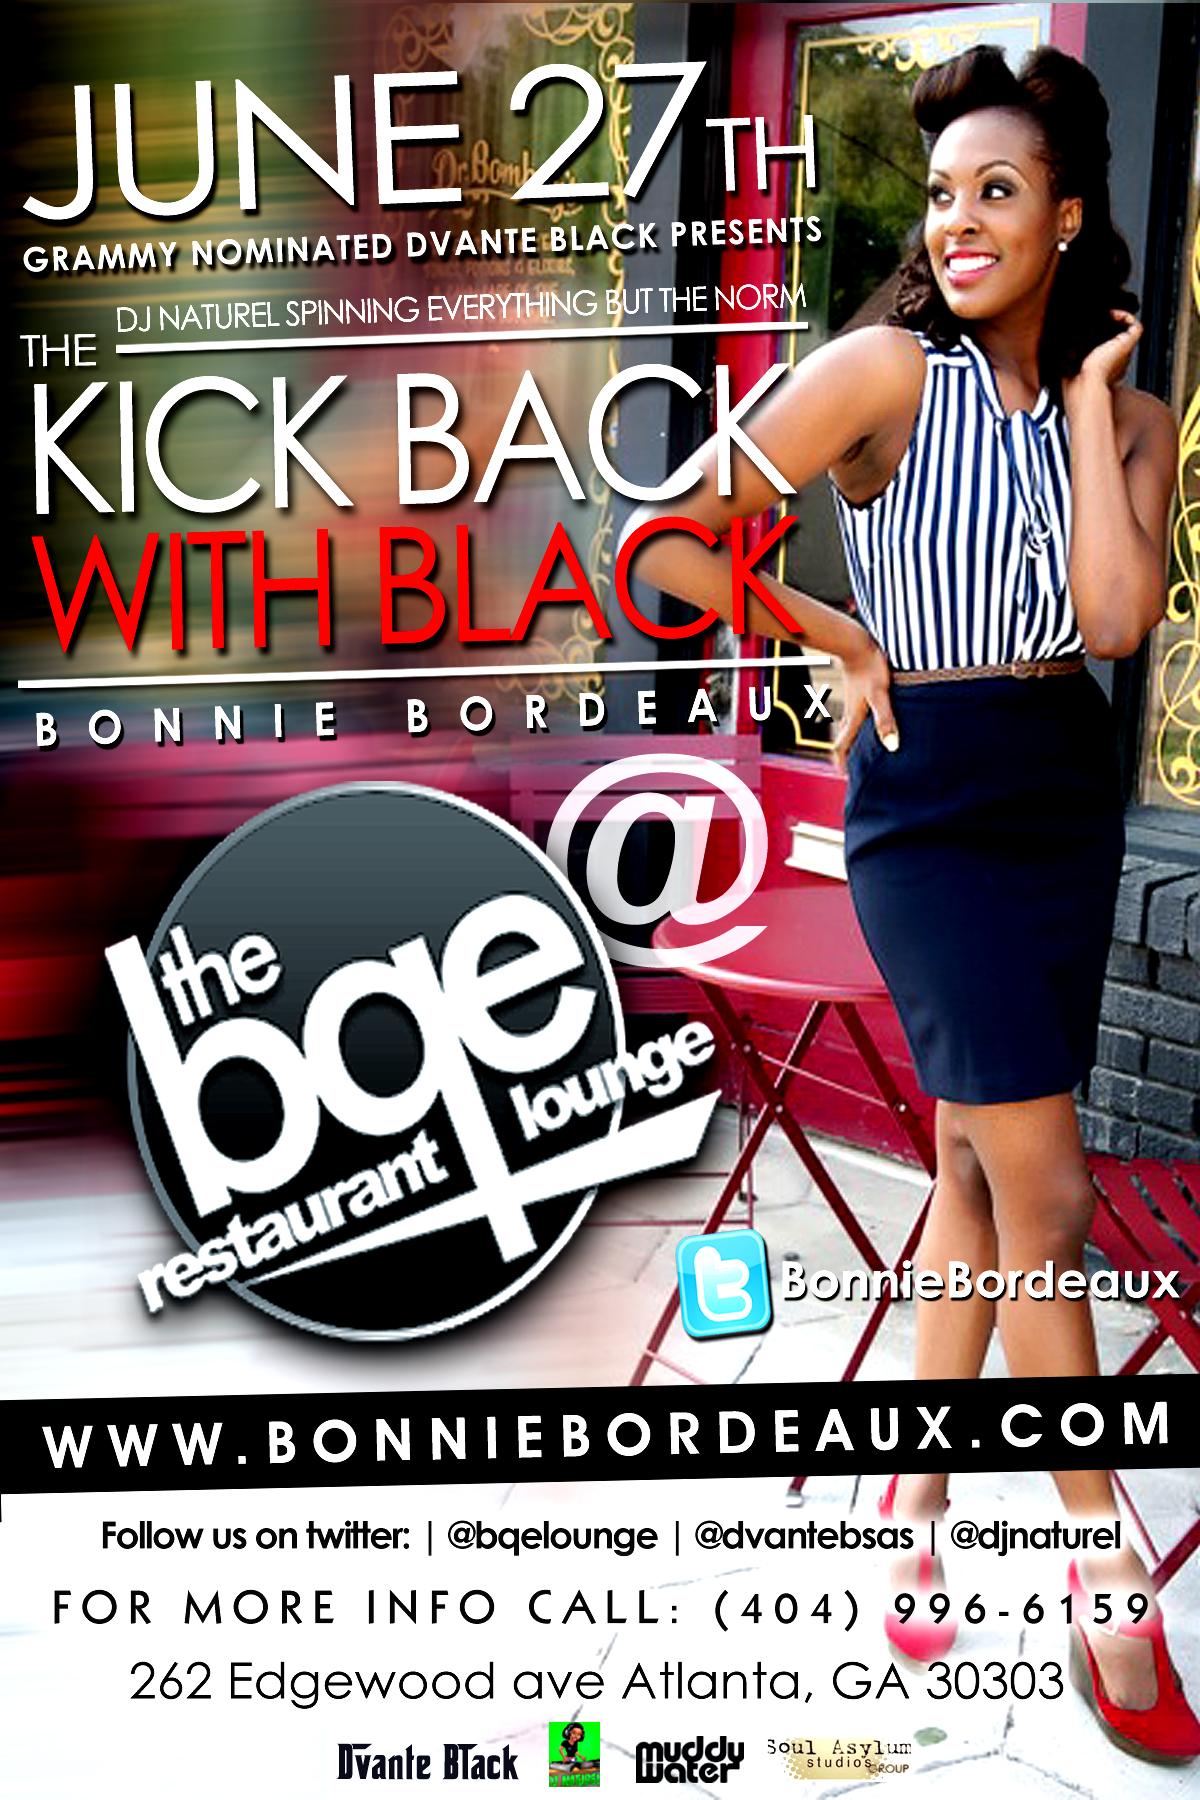 KICK BACK WITH BLACK FLYER  BONNIE BORDEAUX Performance Flyer [Design By IGMM1]